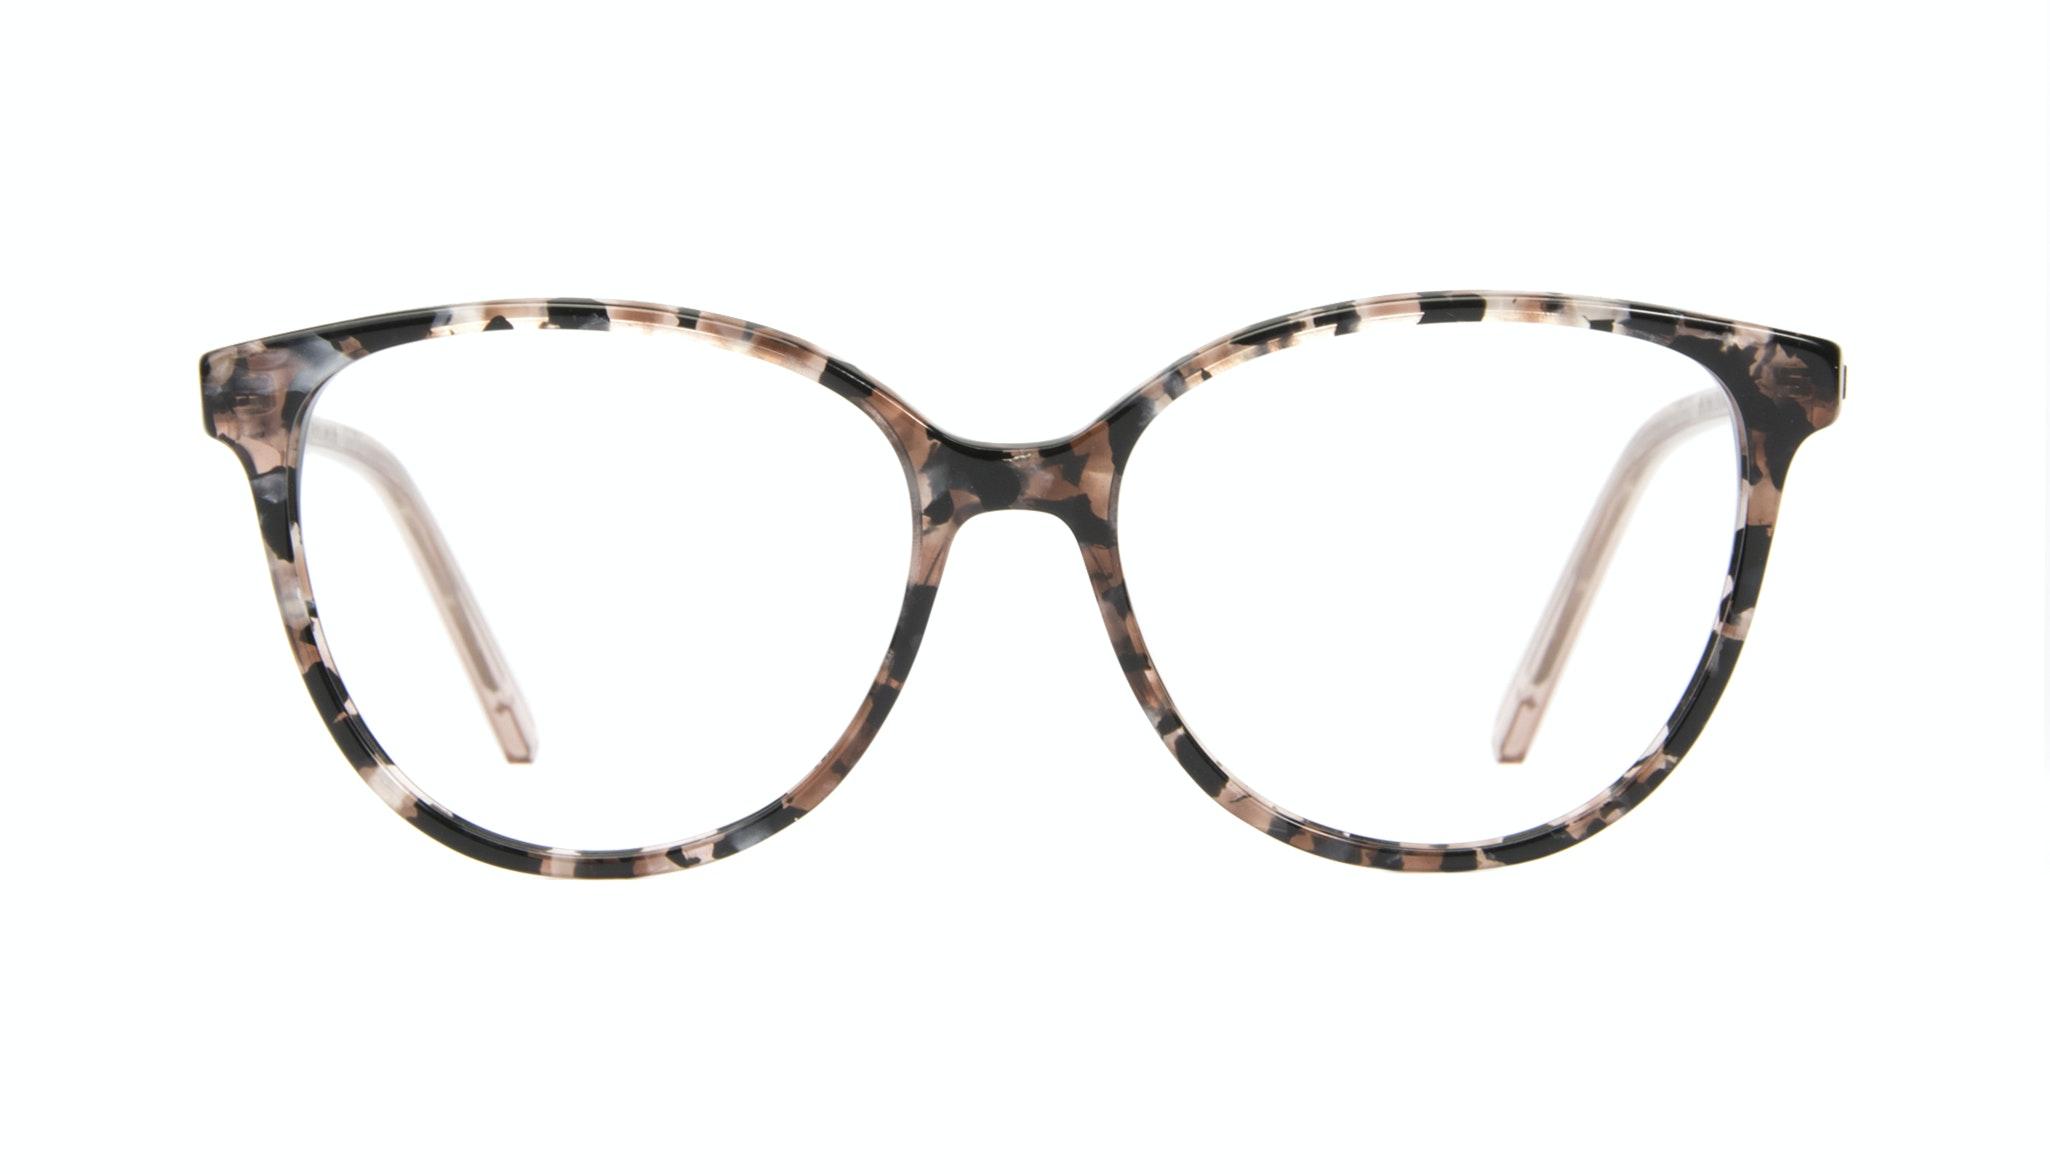 Affordable Fashion Glasses Cat Eye Eyeglasses Women Imagine II Pink Tortoise